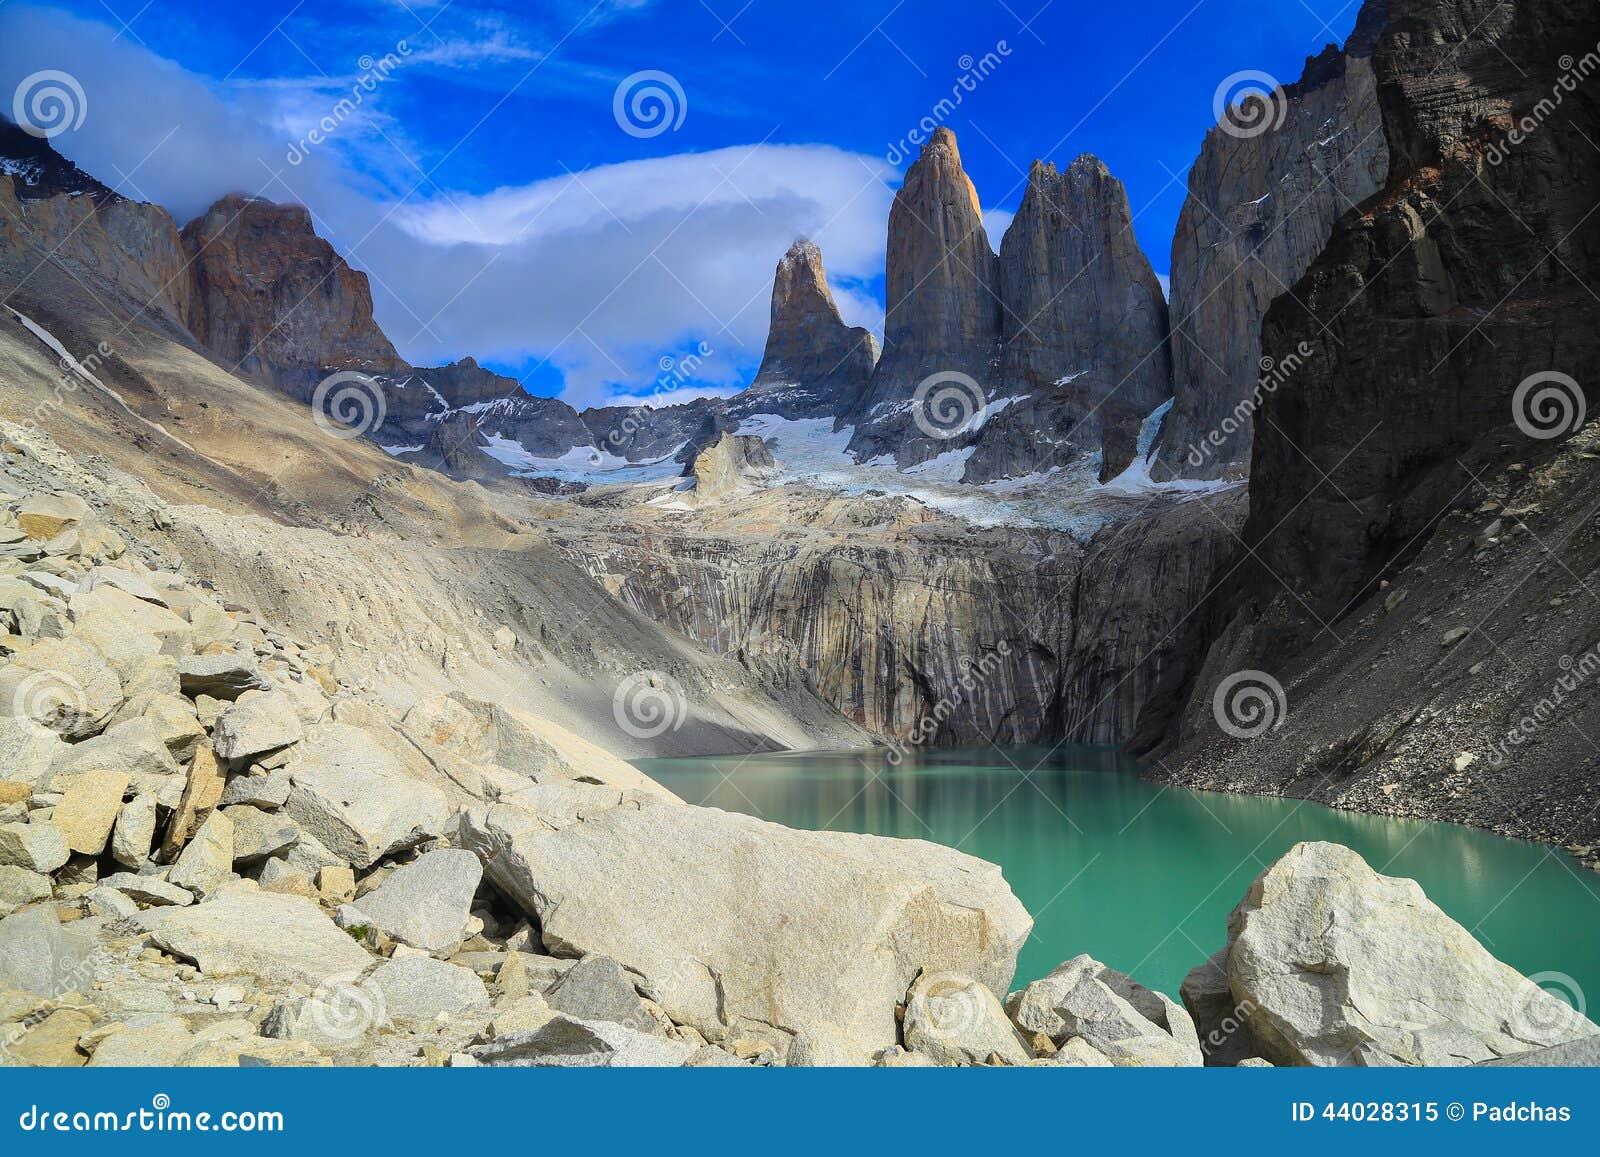 Tramonto nel lago Pehoe, Torres Del Paine, Patagonia, Cile